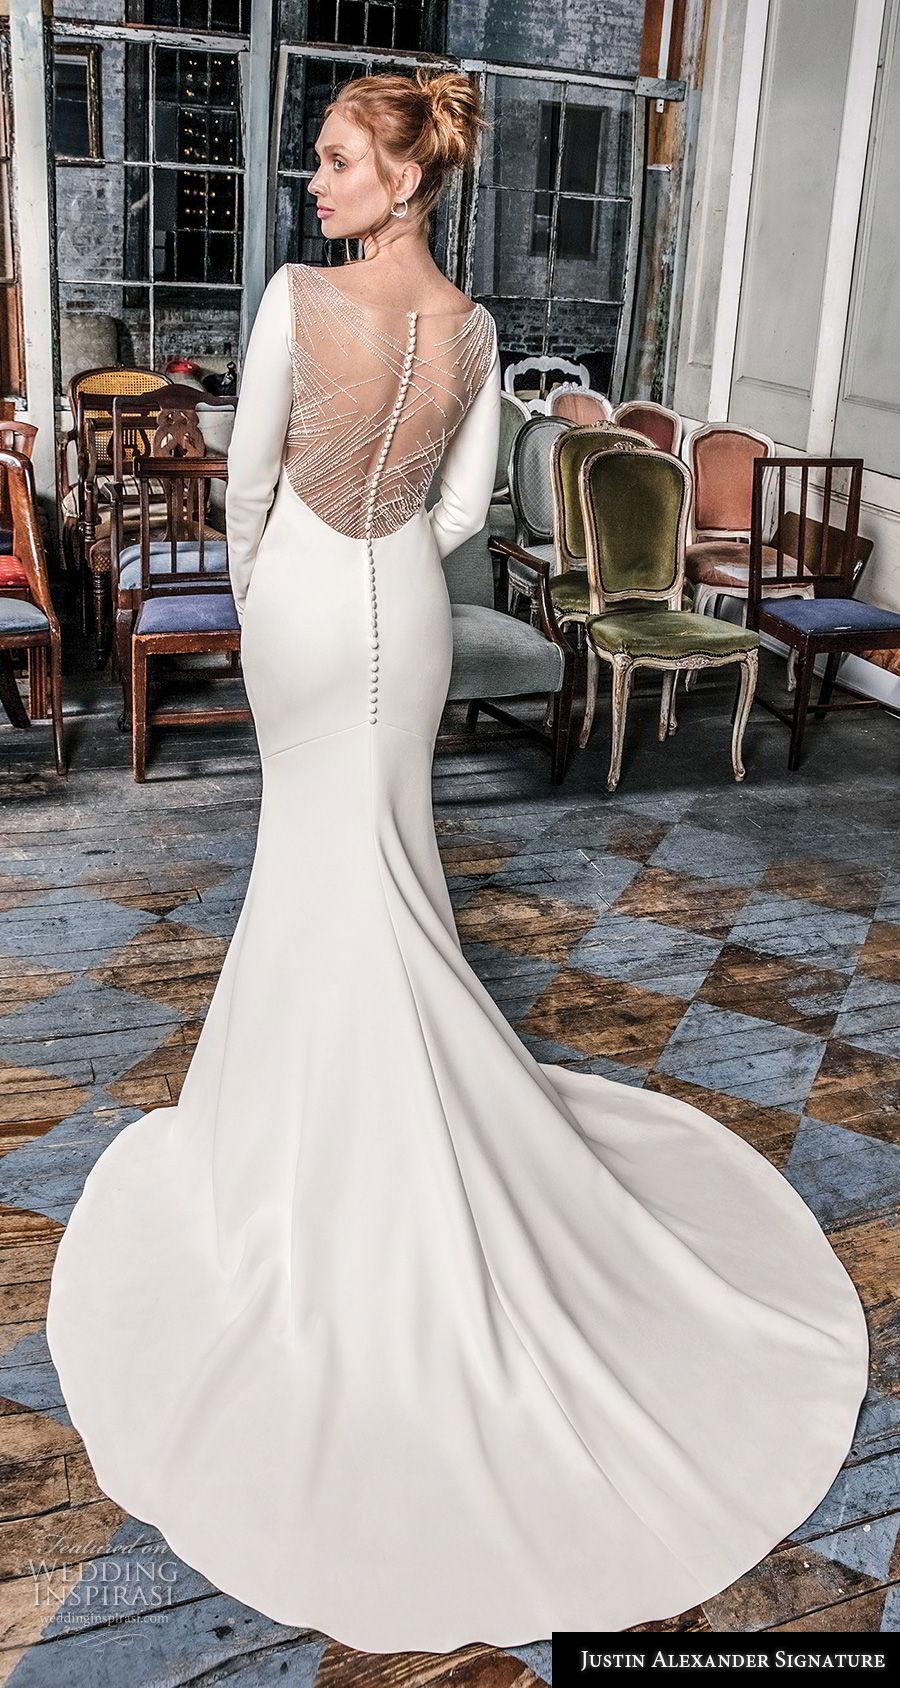 justin alexander fall 2018 signature long sleeves v neck simple minimalist elegant sheath fit and flare wedding dress sheer button back chapel train (12) bv